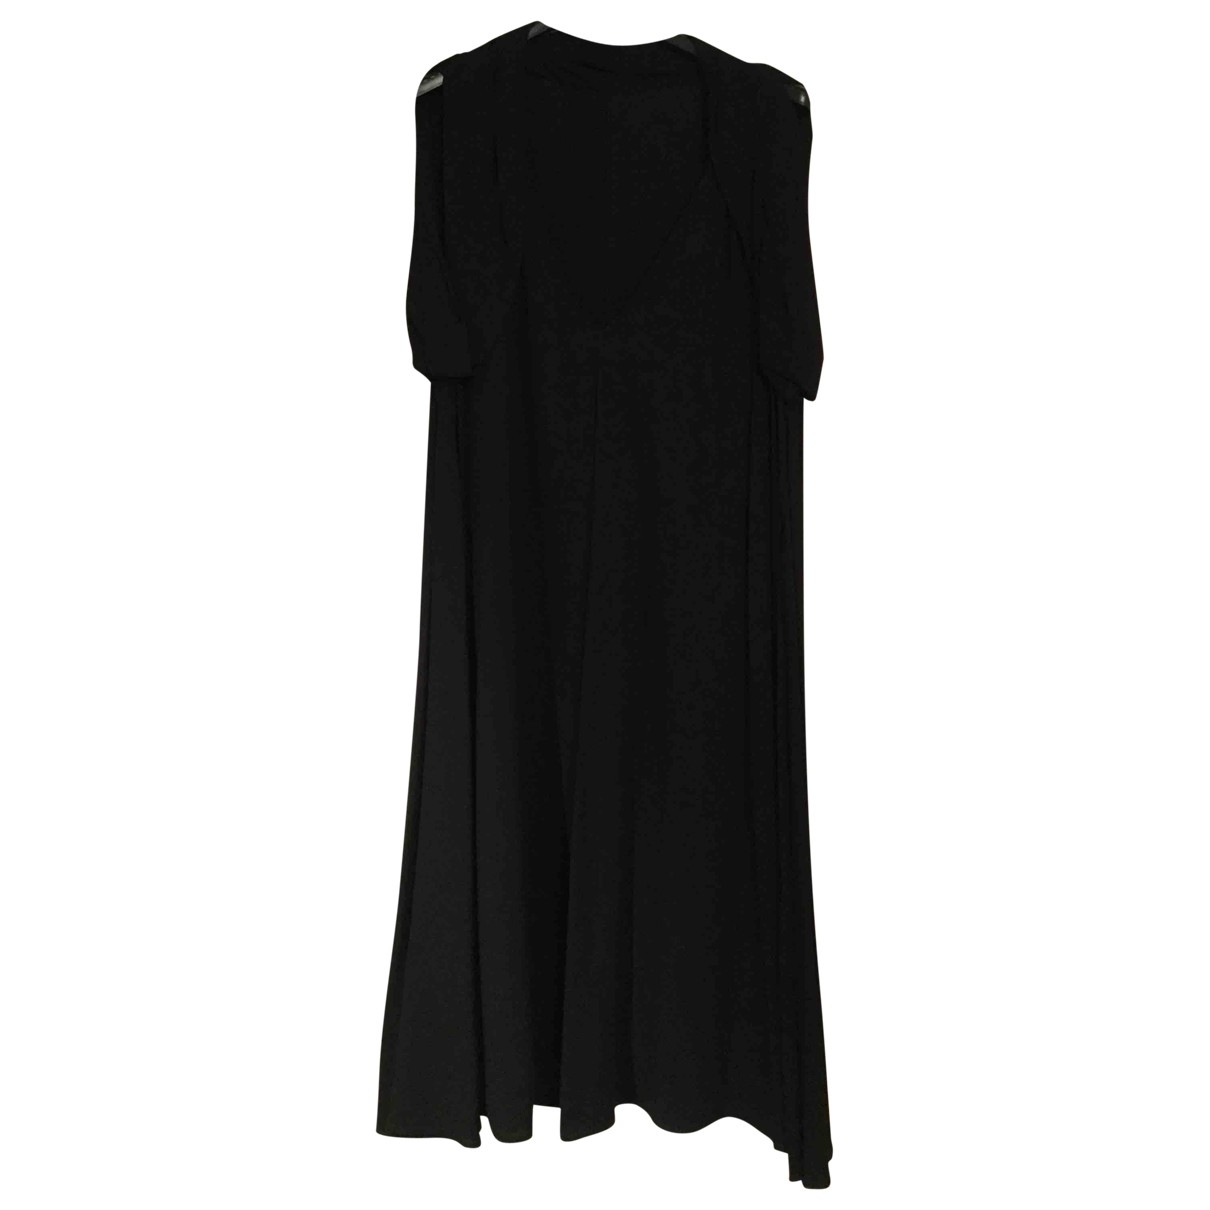 Prada \N Black dress for Women 42 IT